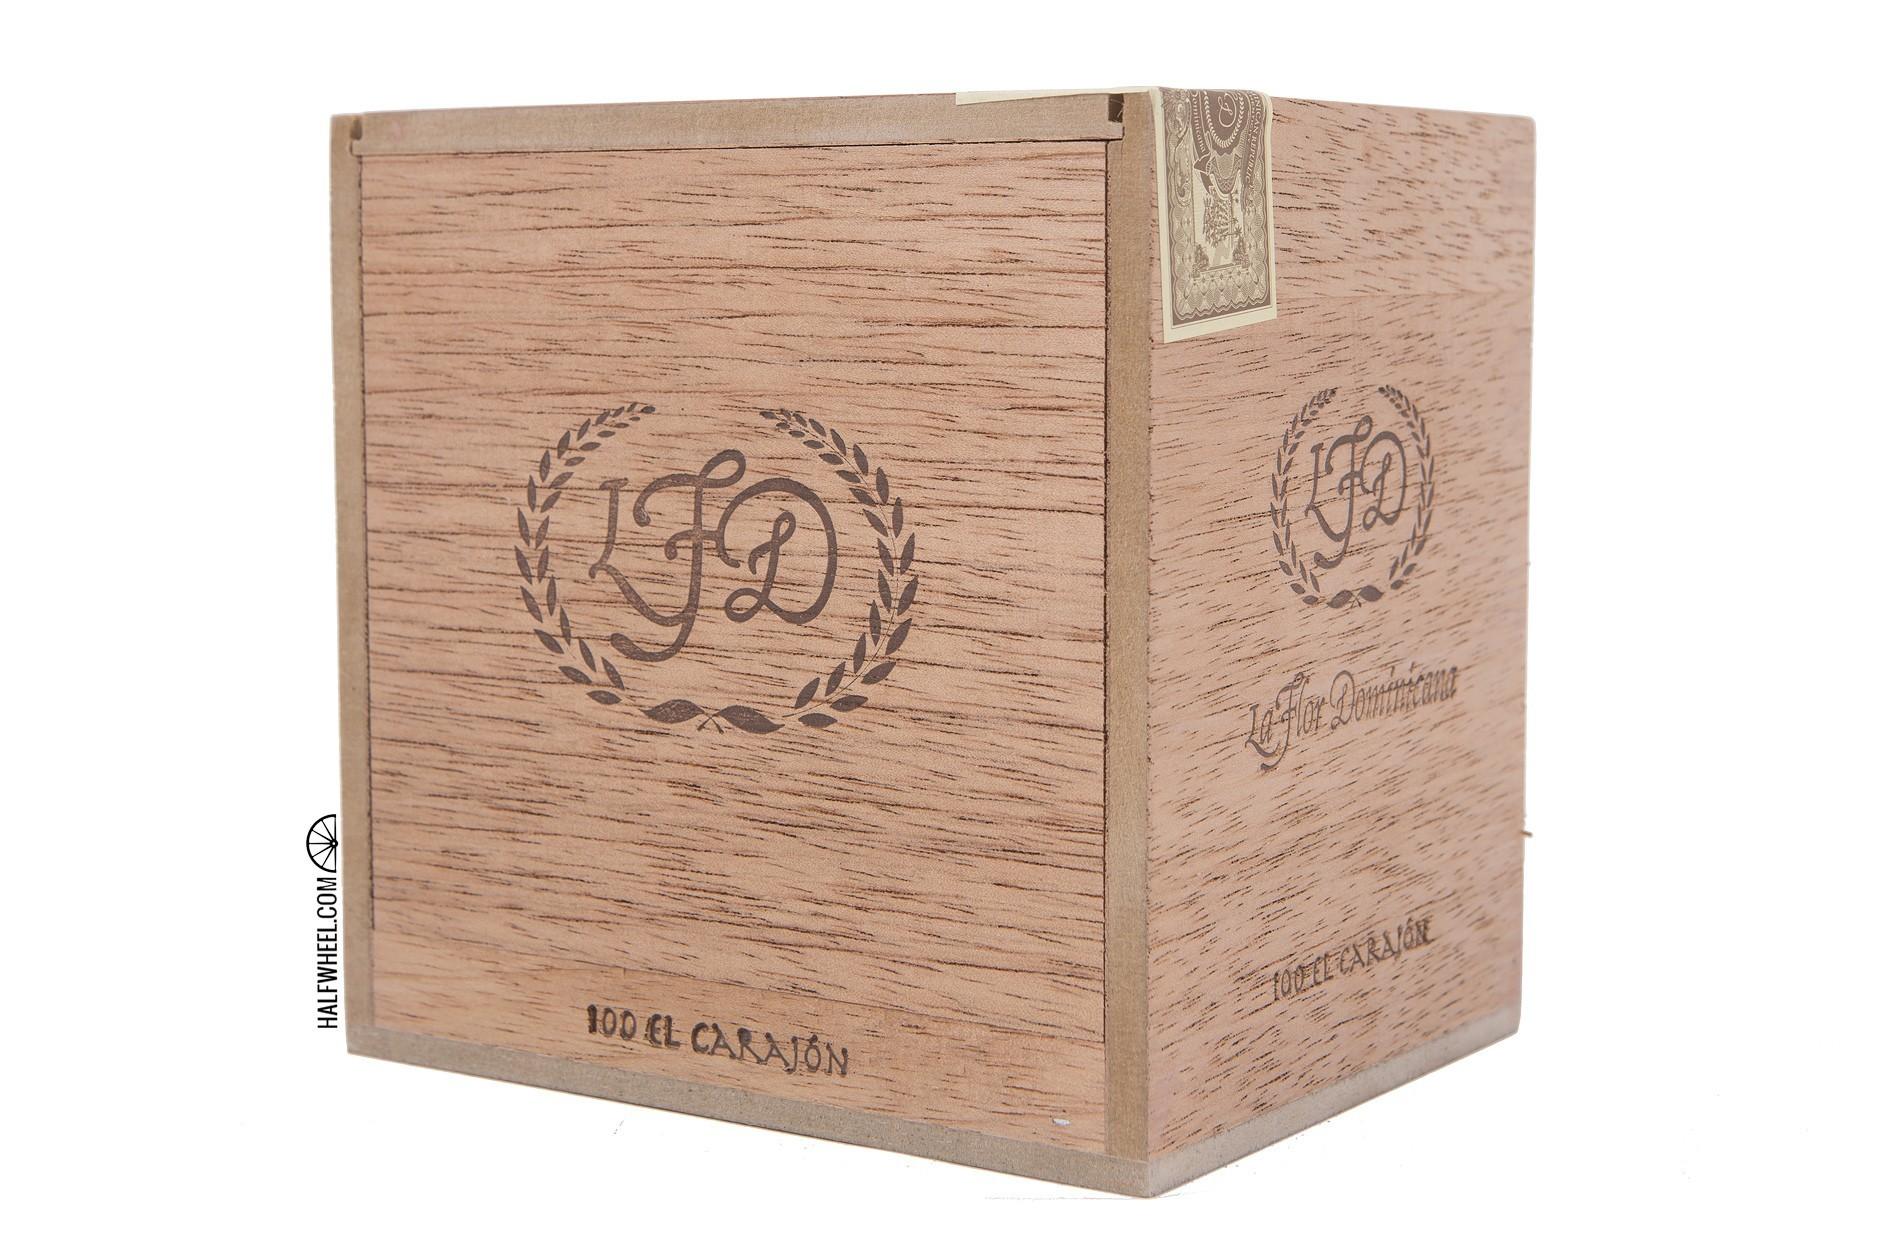 La Flor Dominicana El Carajon Box 1